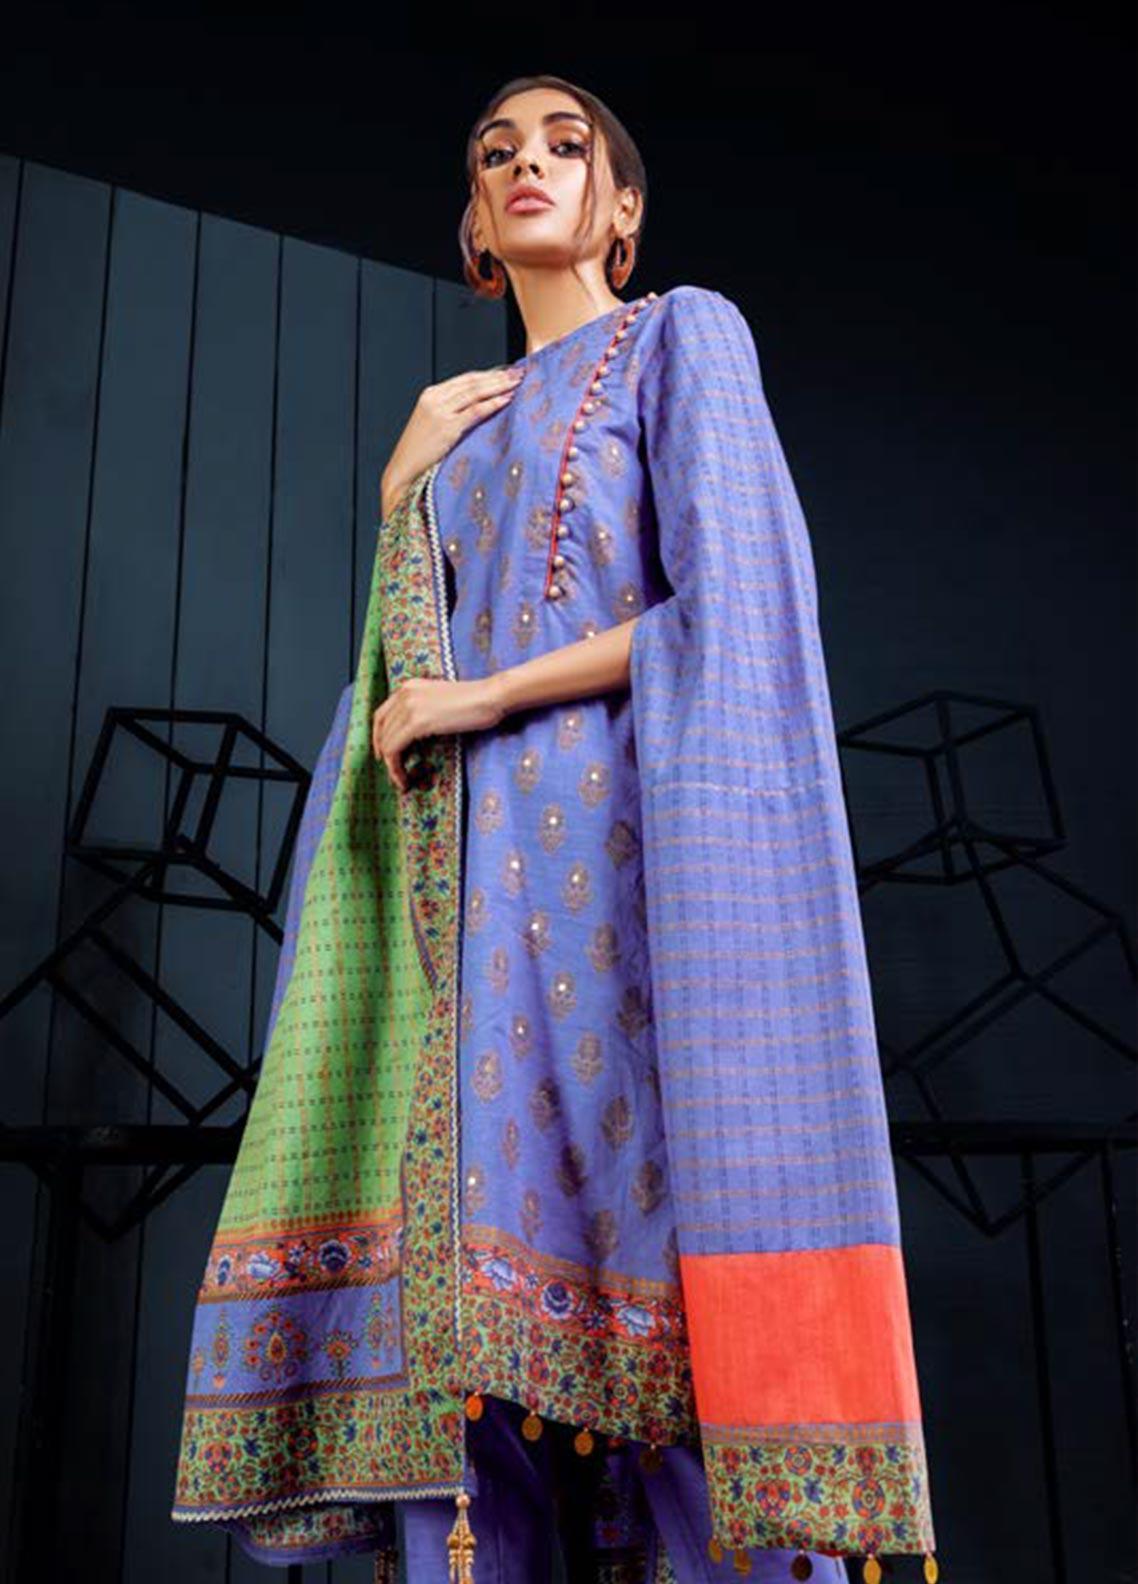 Orient Textile Embroidered Khaddar Unstitched 3 Piece Suit OT19W 188 HARVEST A - Winter Collection